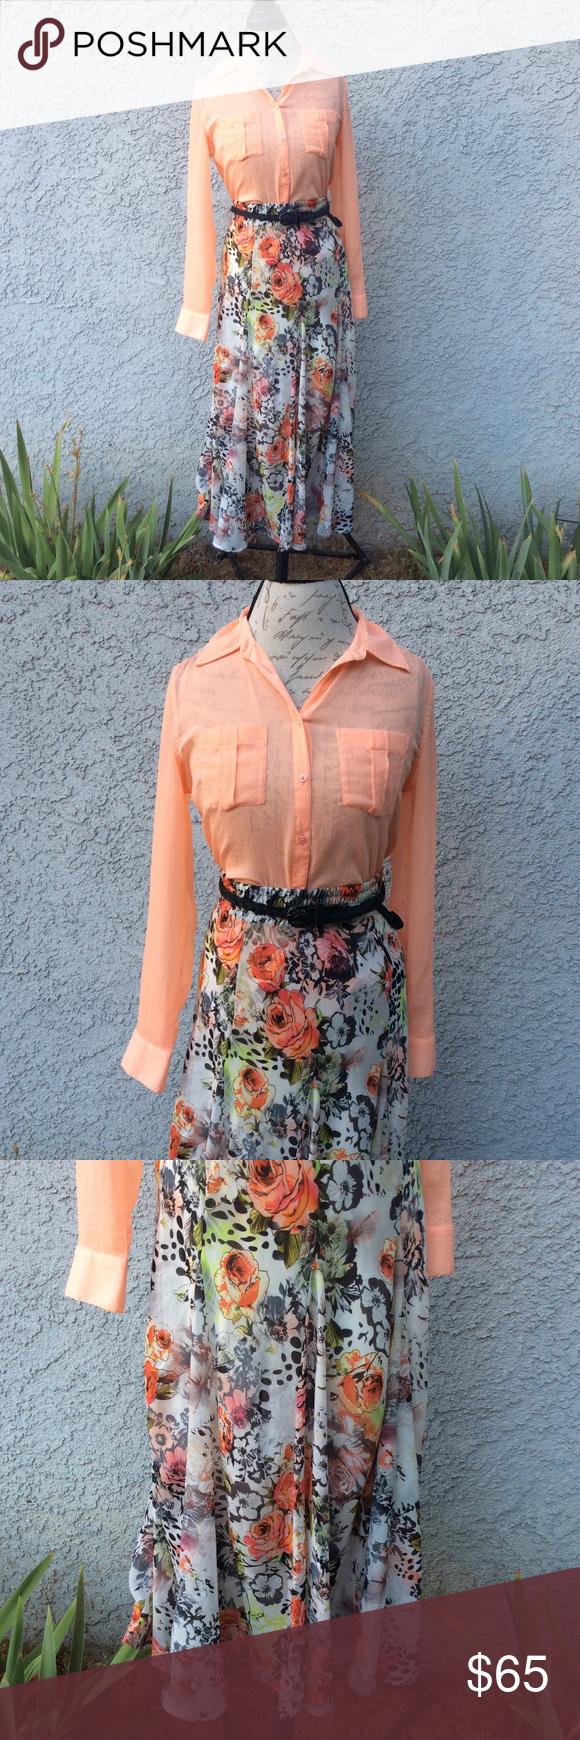 Guess orange sheer shirt lapis floral maxi skirt in my posh